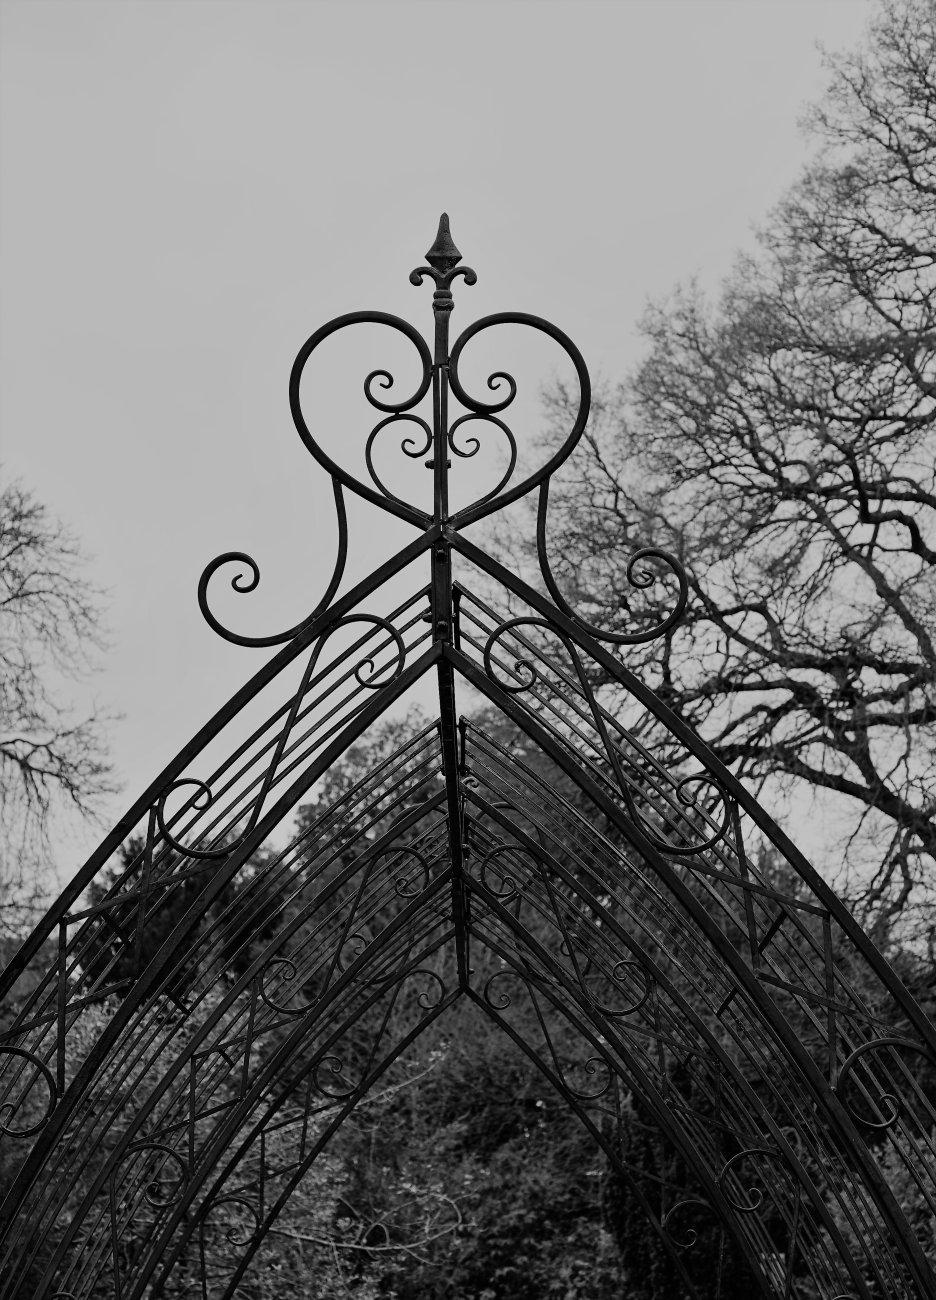 Overhead Romantic Heart